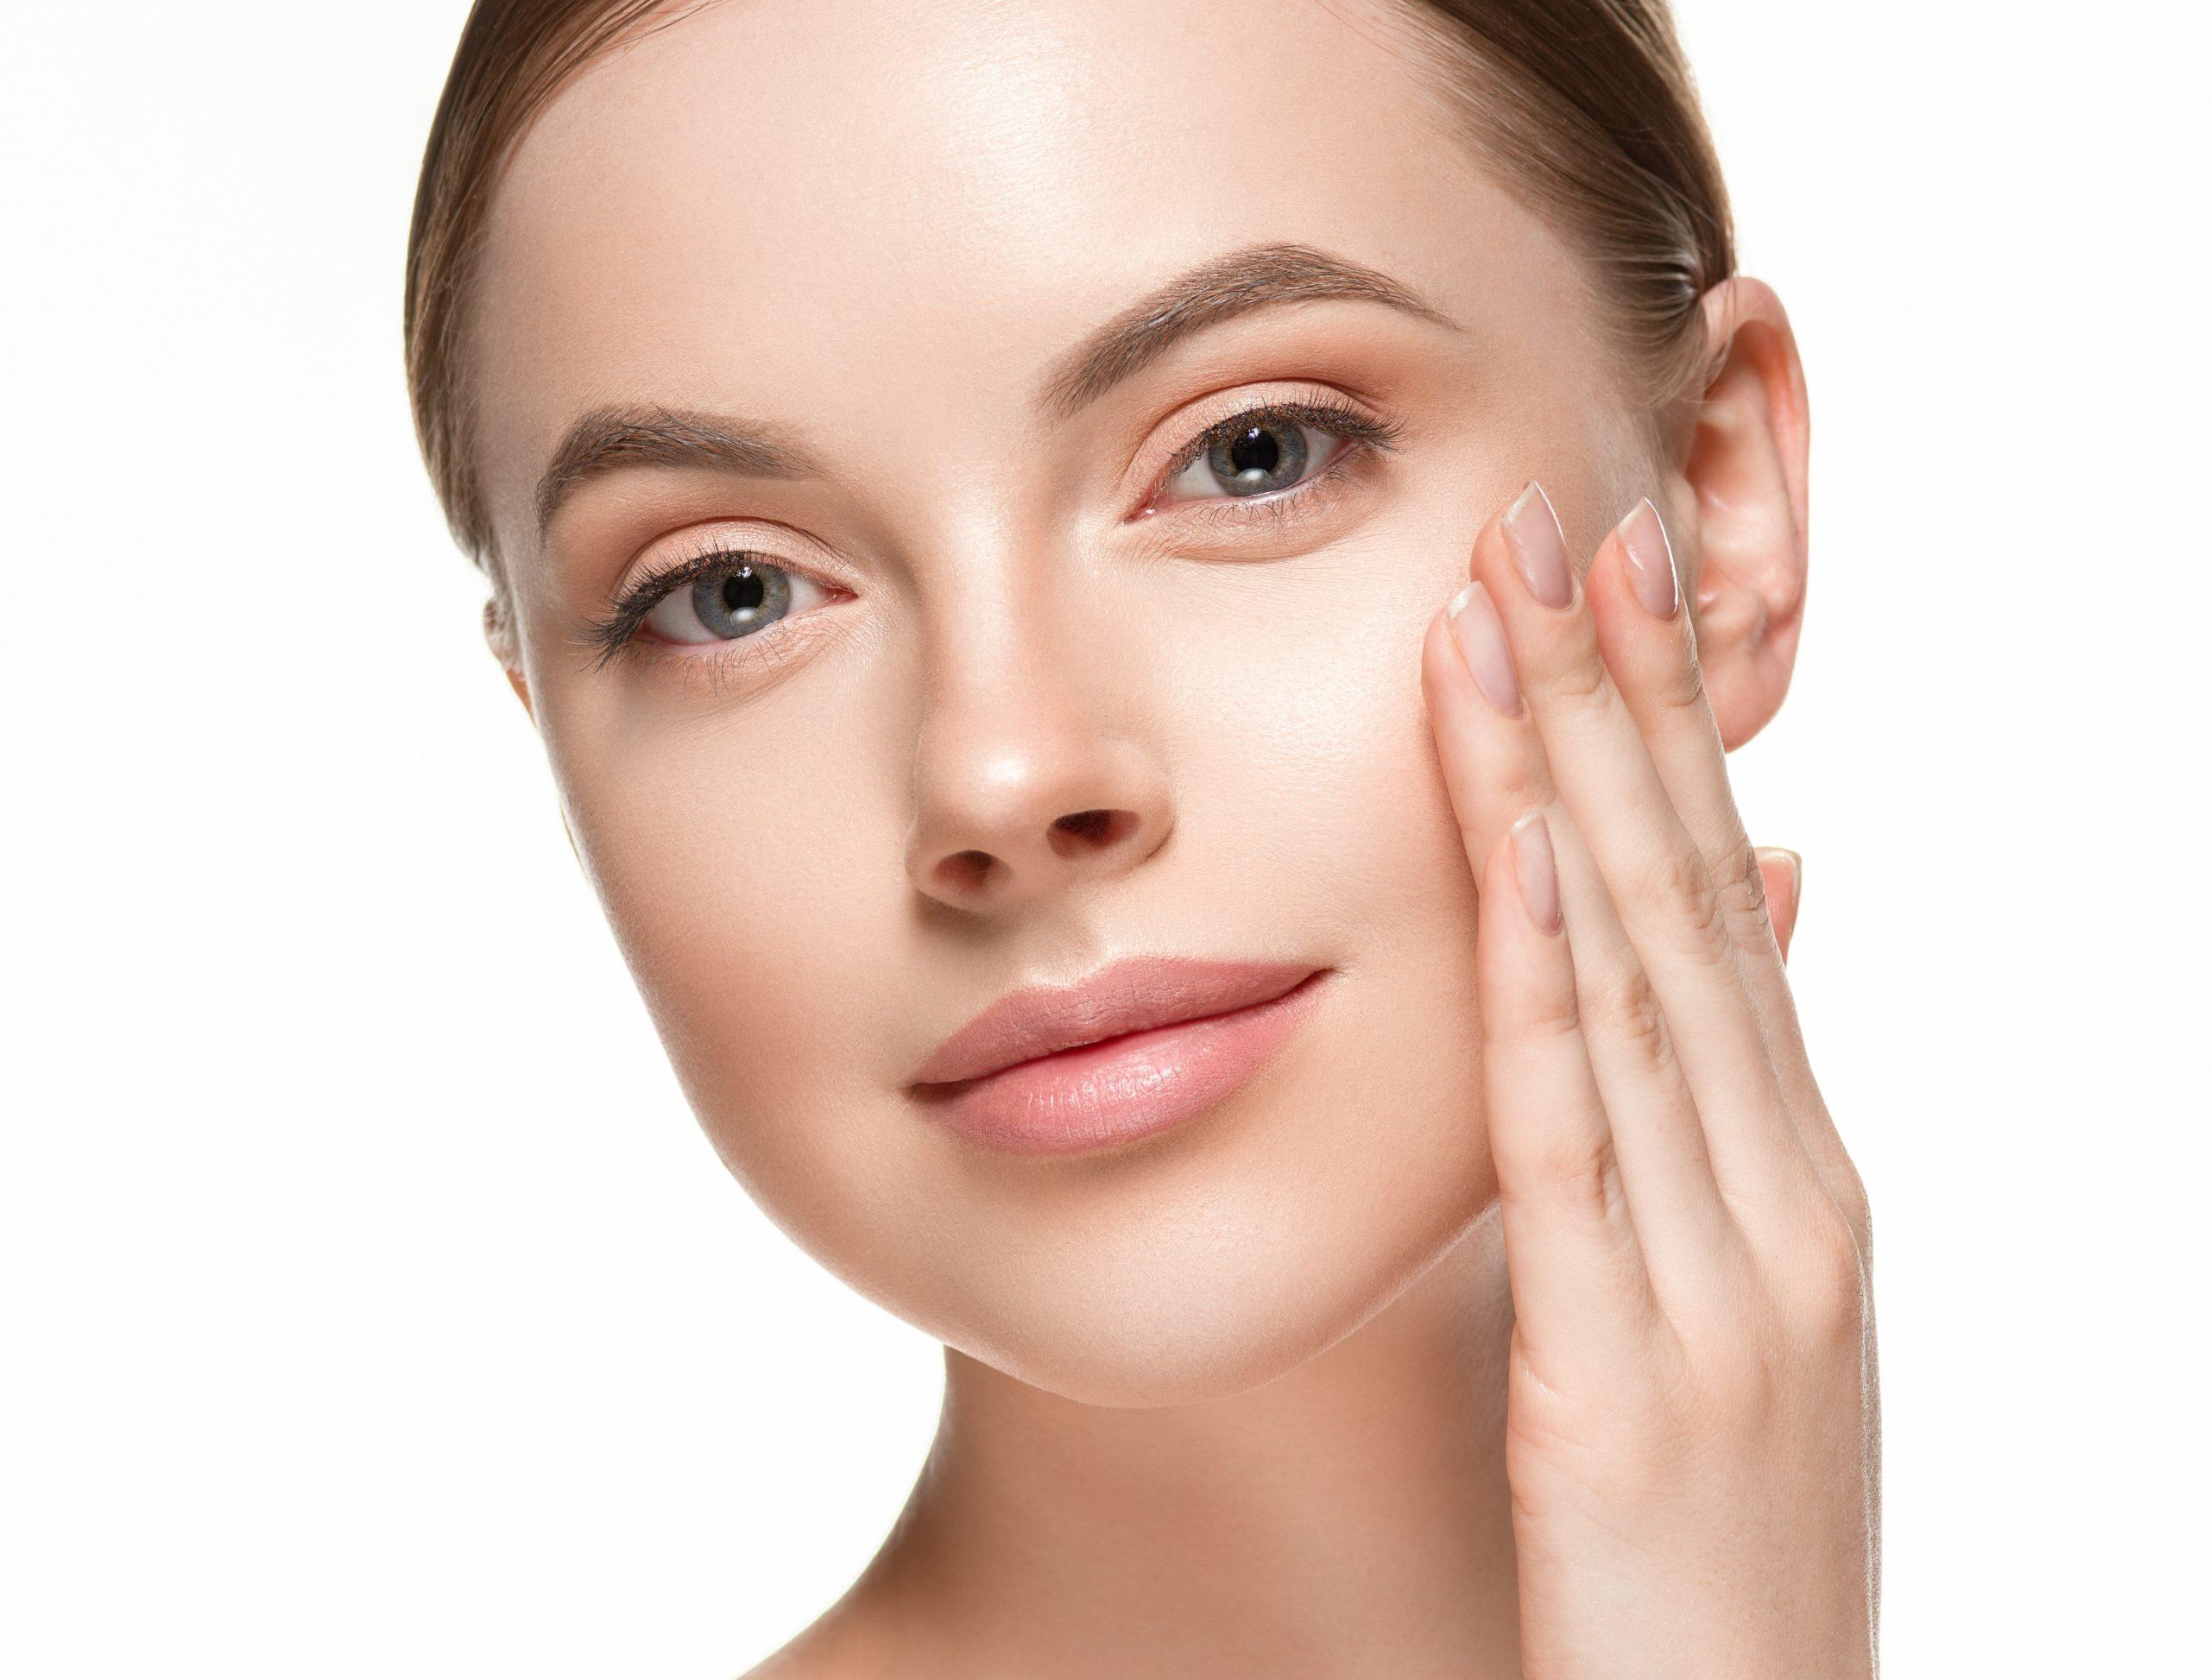 Clearsilk skin treatment